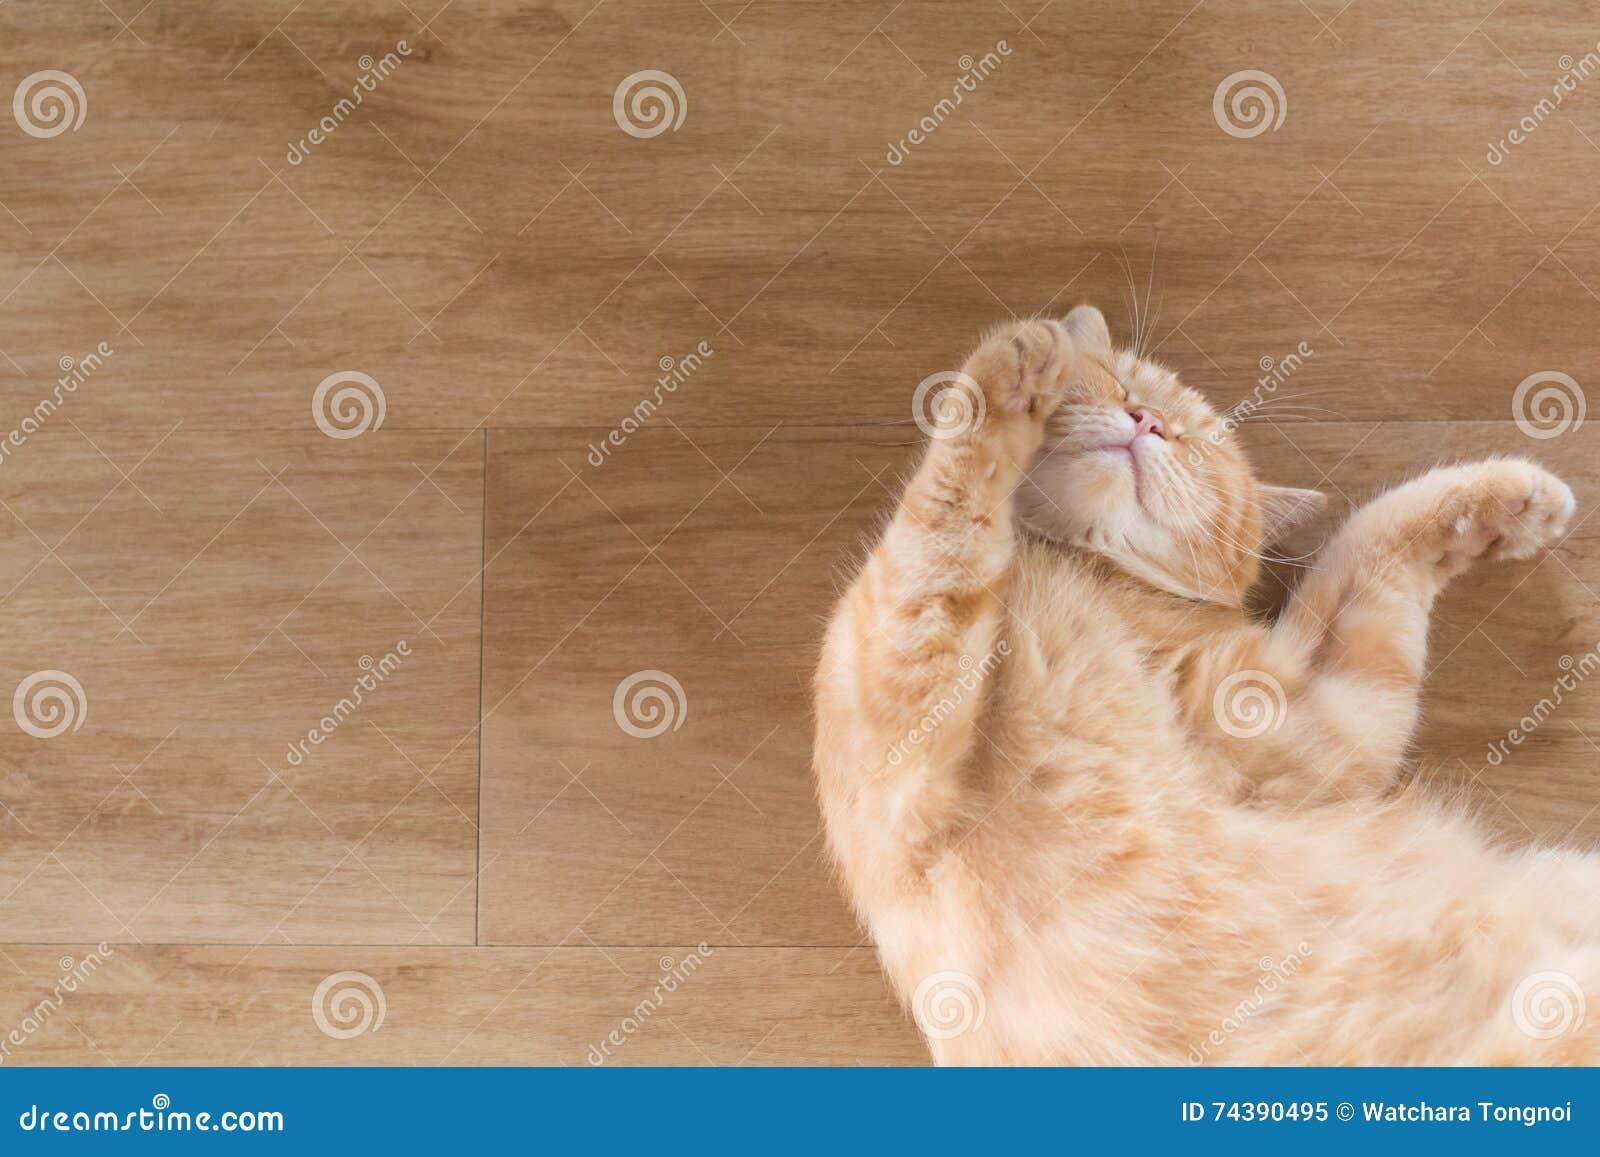 Orange cat american short hair sleeping